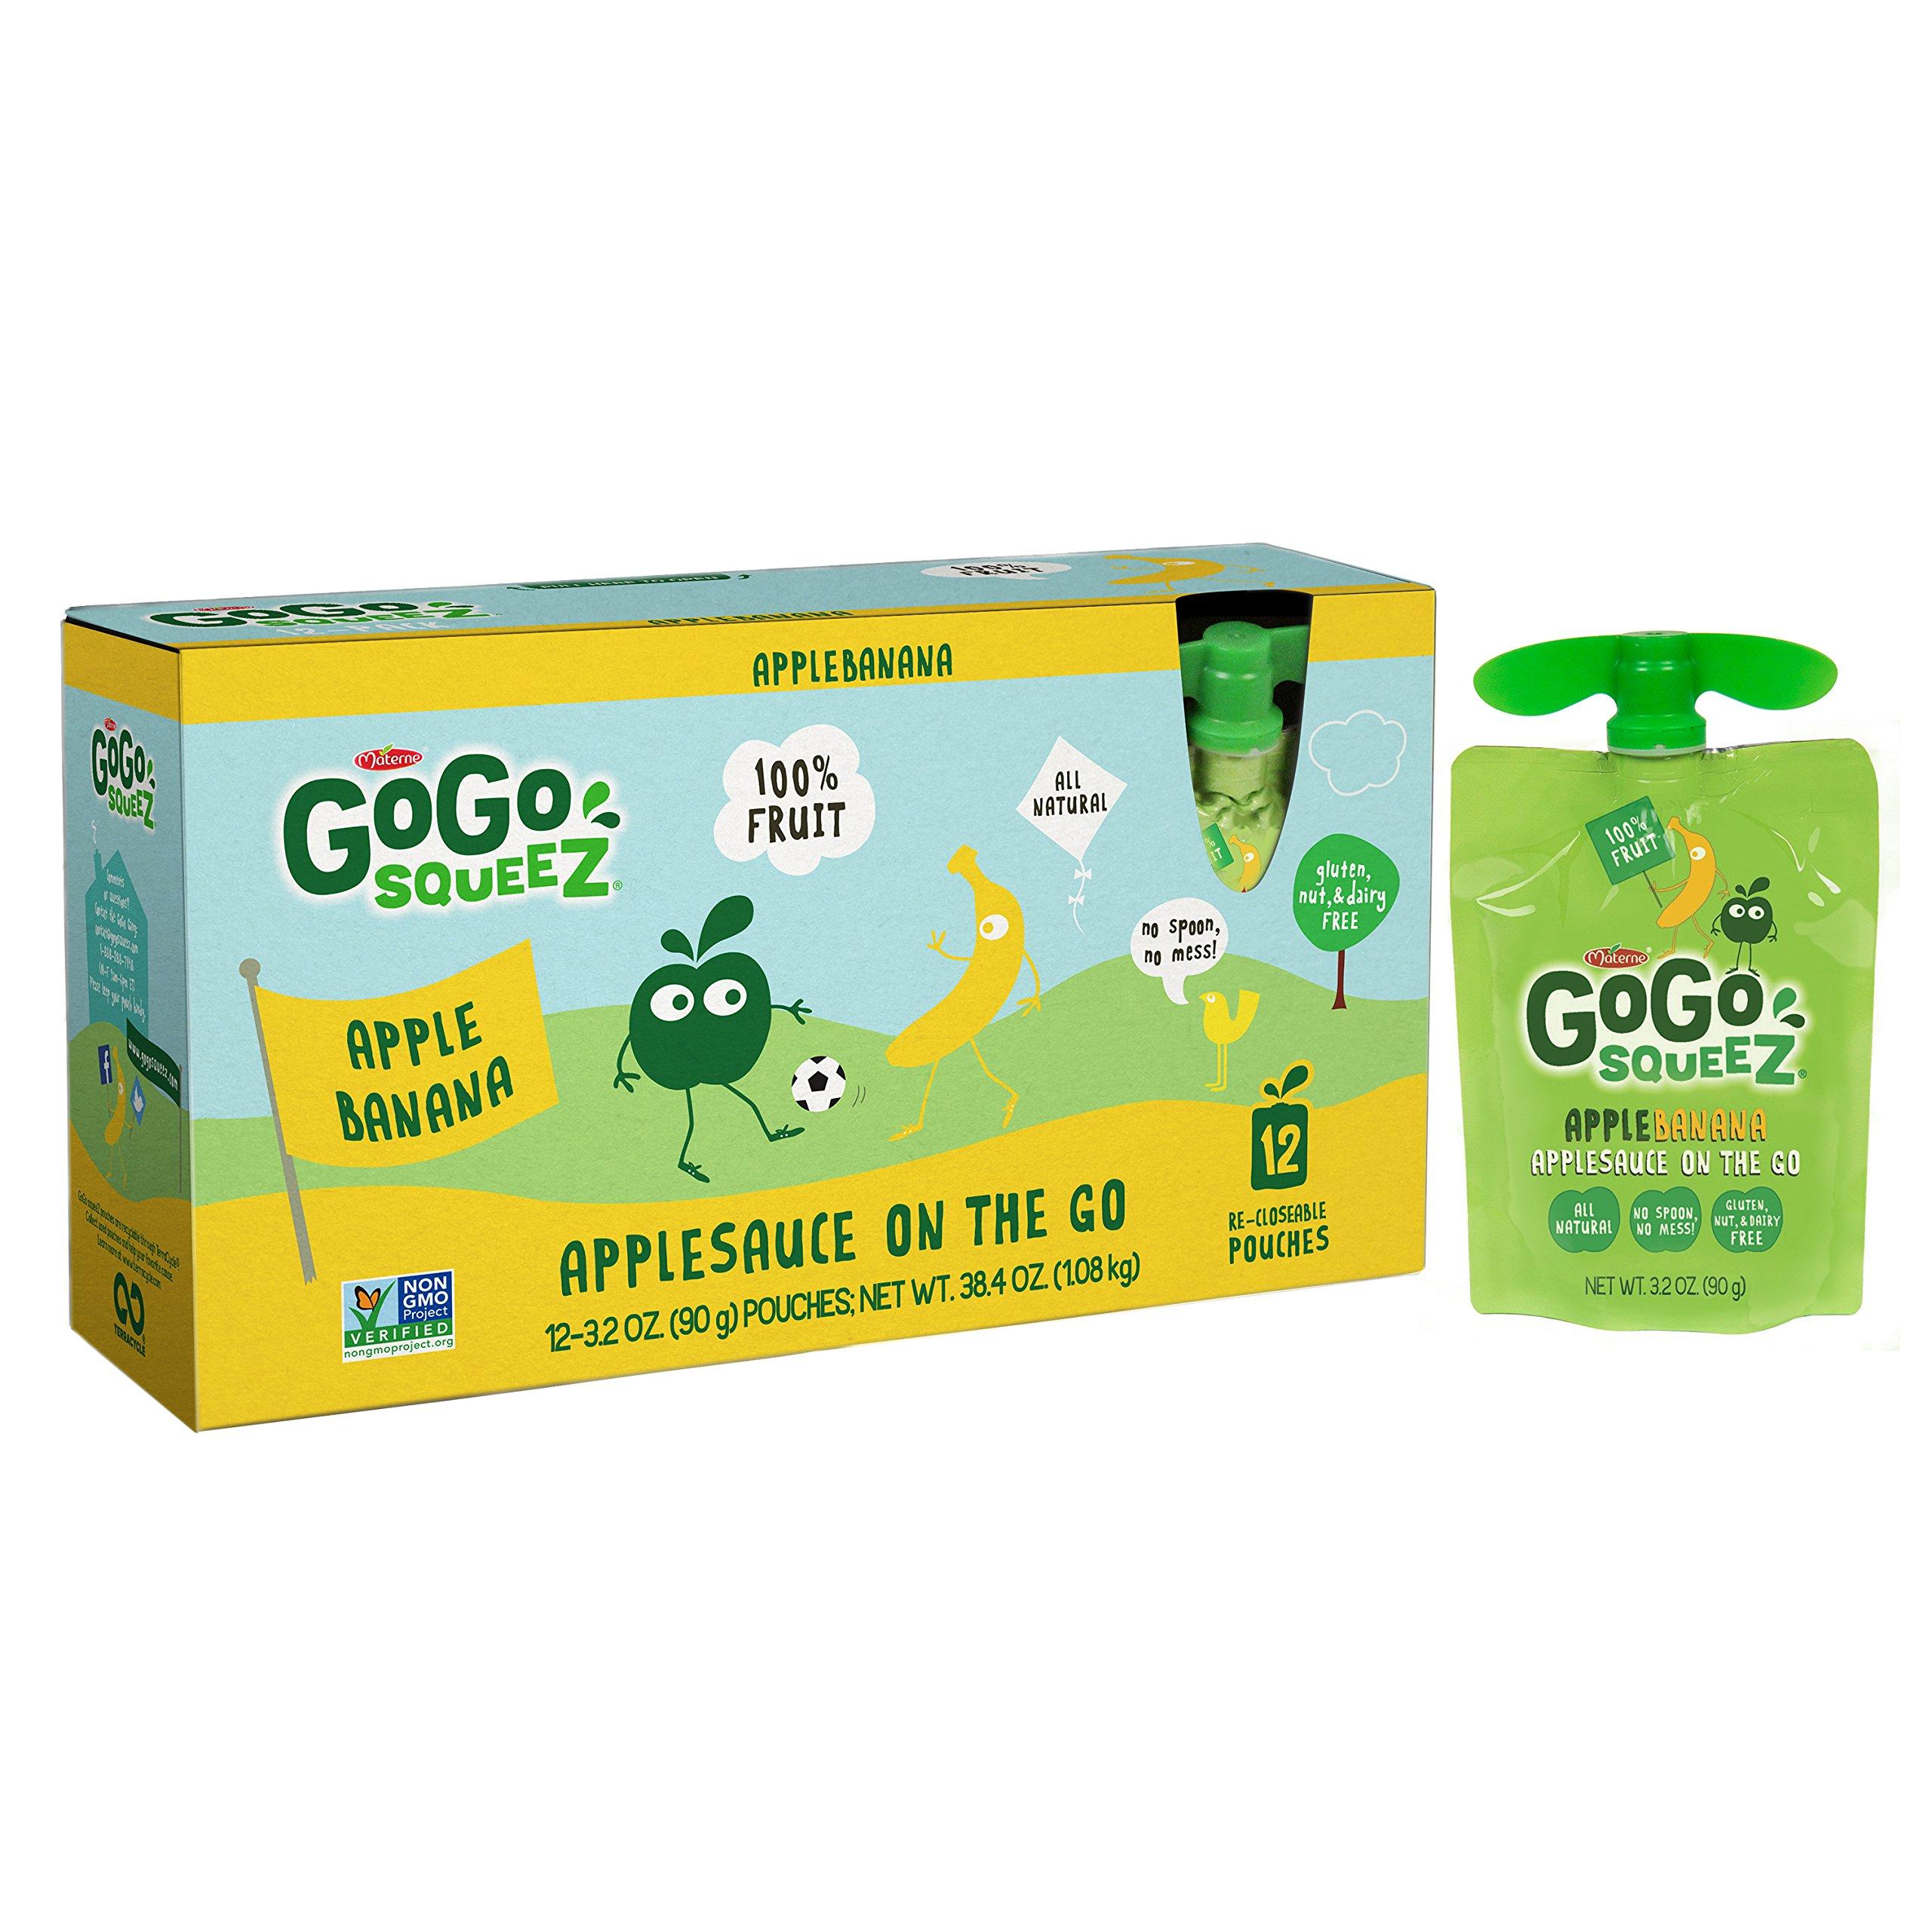 GoGo squeeZ Applesauce on the Go, Apple Banana, 3.2 Ounce Portable BPA-Free Pouches, Gluten-Free, 12 Total Pouches